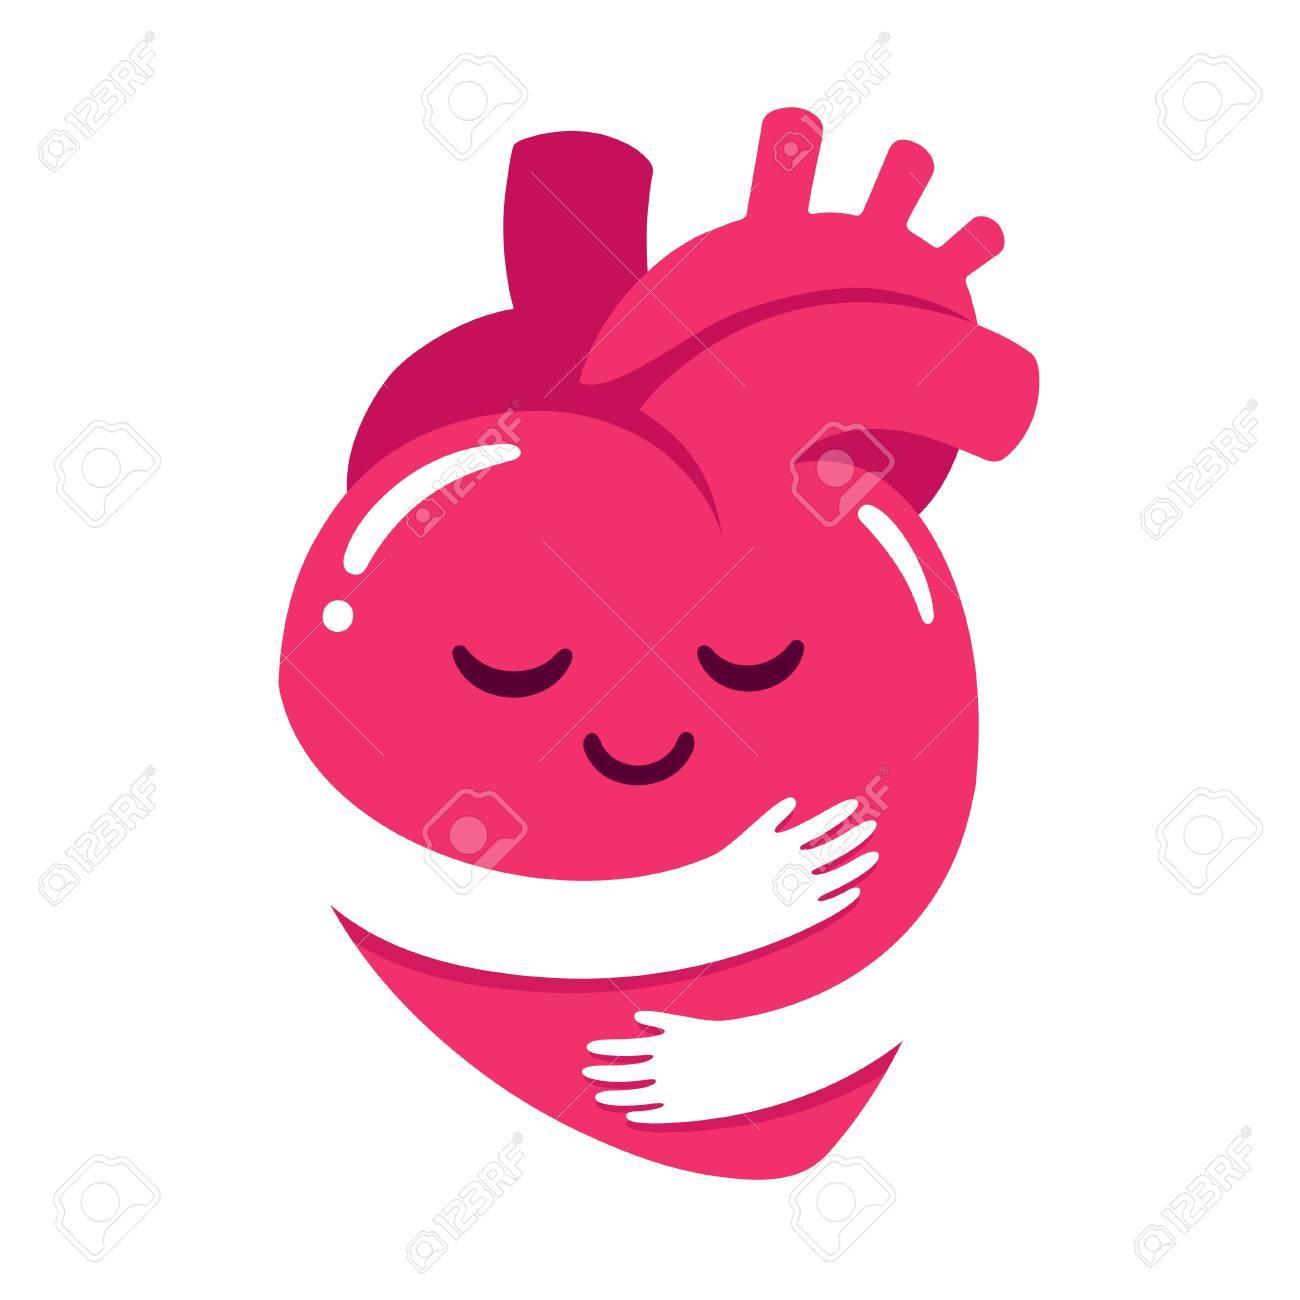 Love yourself, cute cartoon heart character hug. Realistic anatomic...